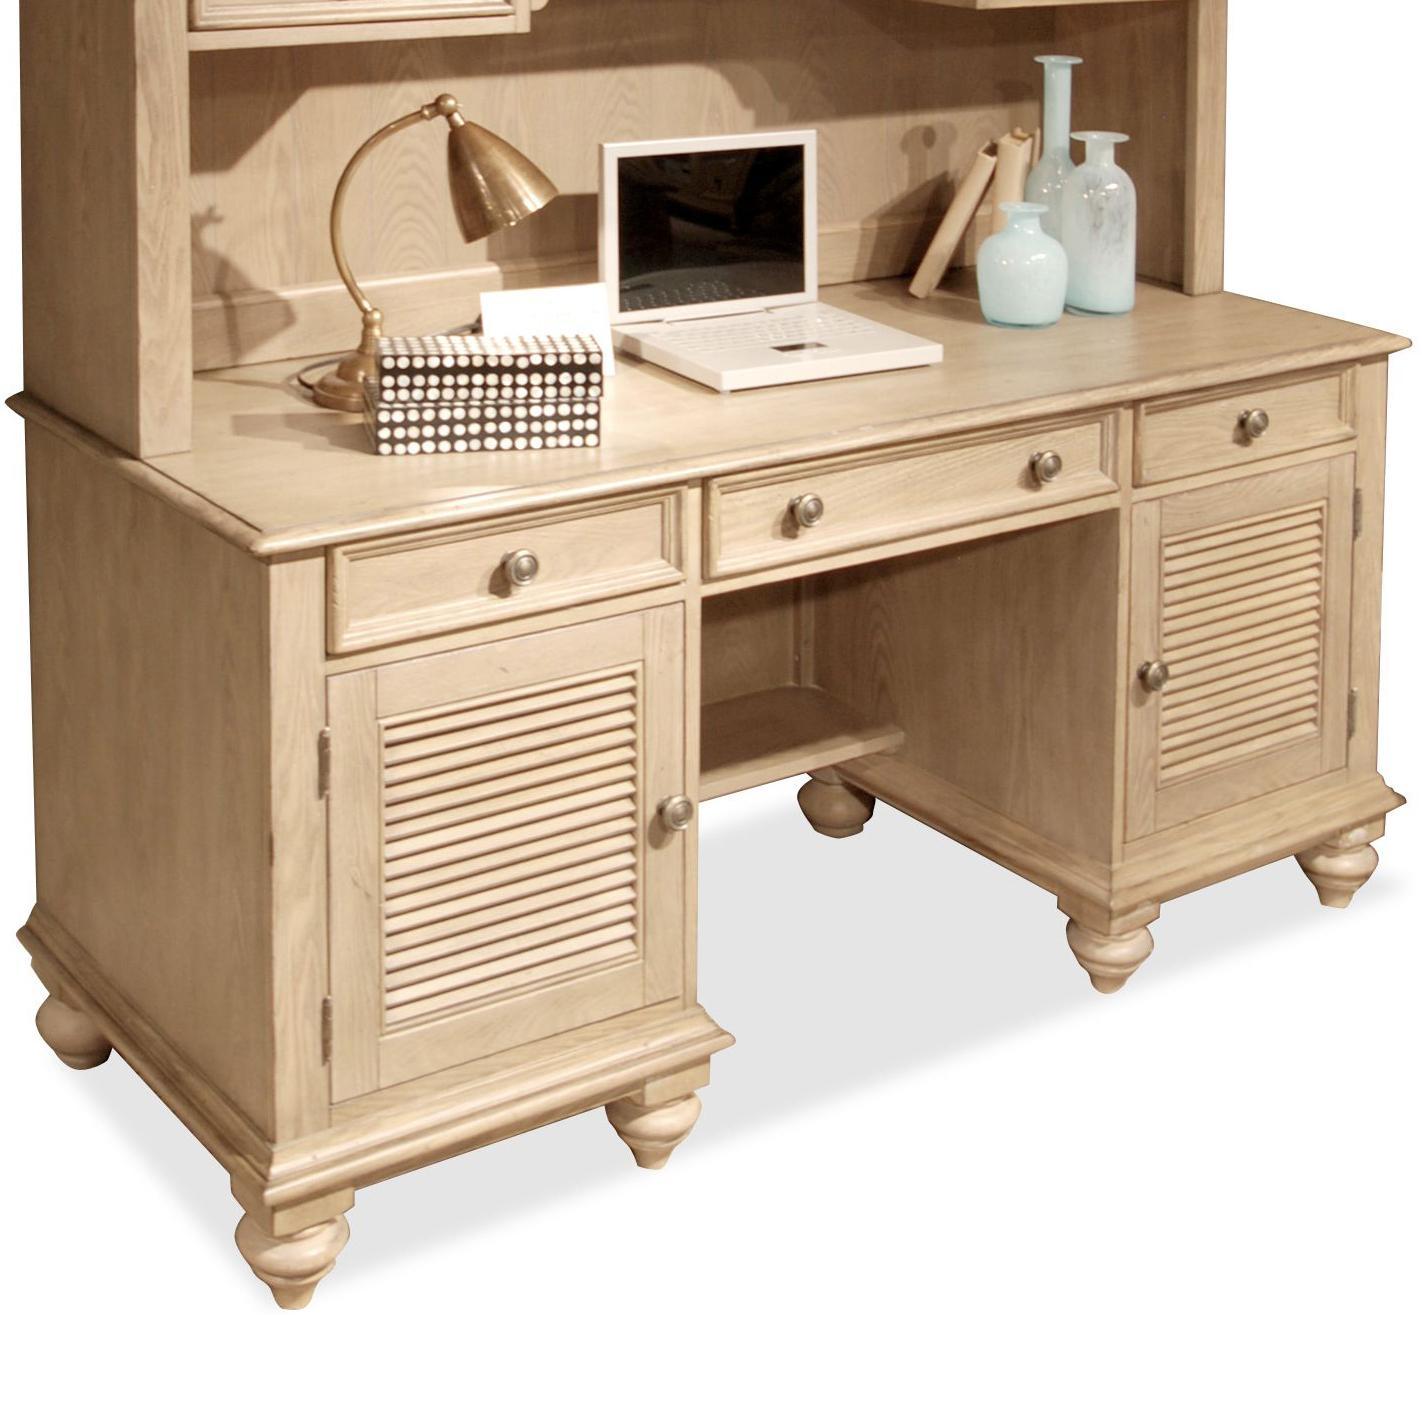 Riverside Furniture Coventry Shutter Door Credenza Desk With 2 Doors Value City Furniture